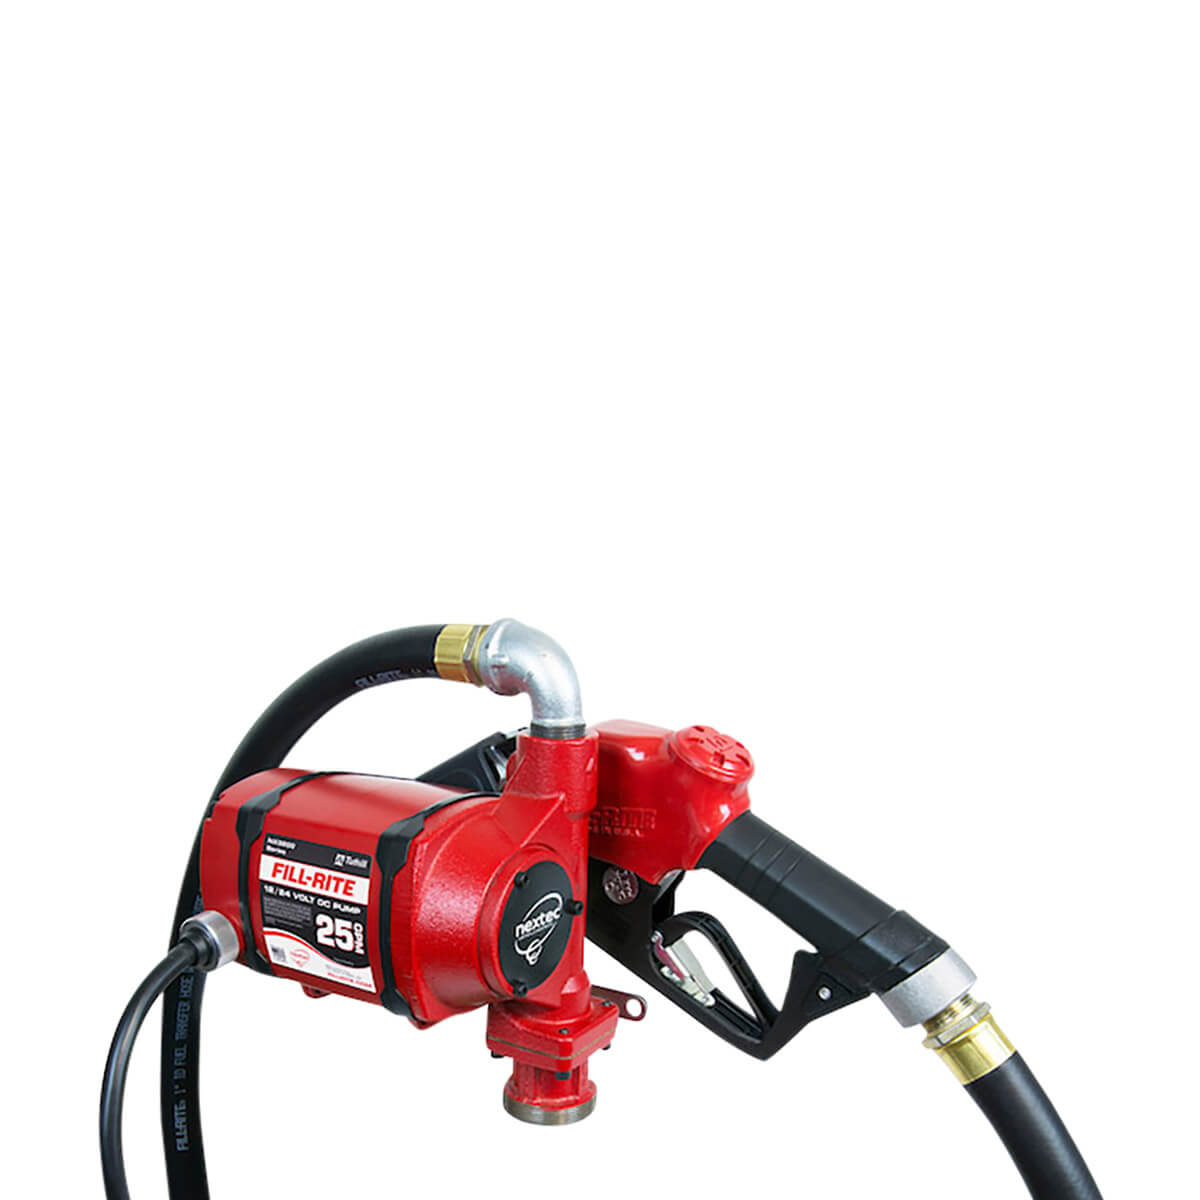 Fill-Rite NX3200 Series - Pump, Hose and Nozzle